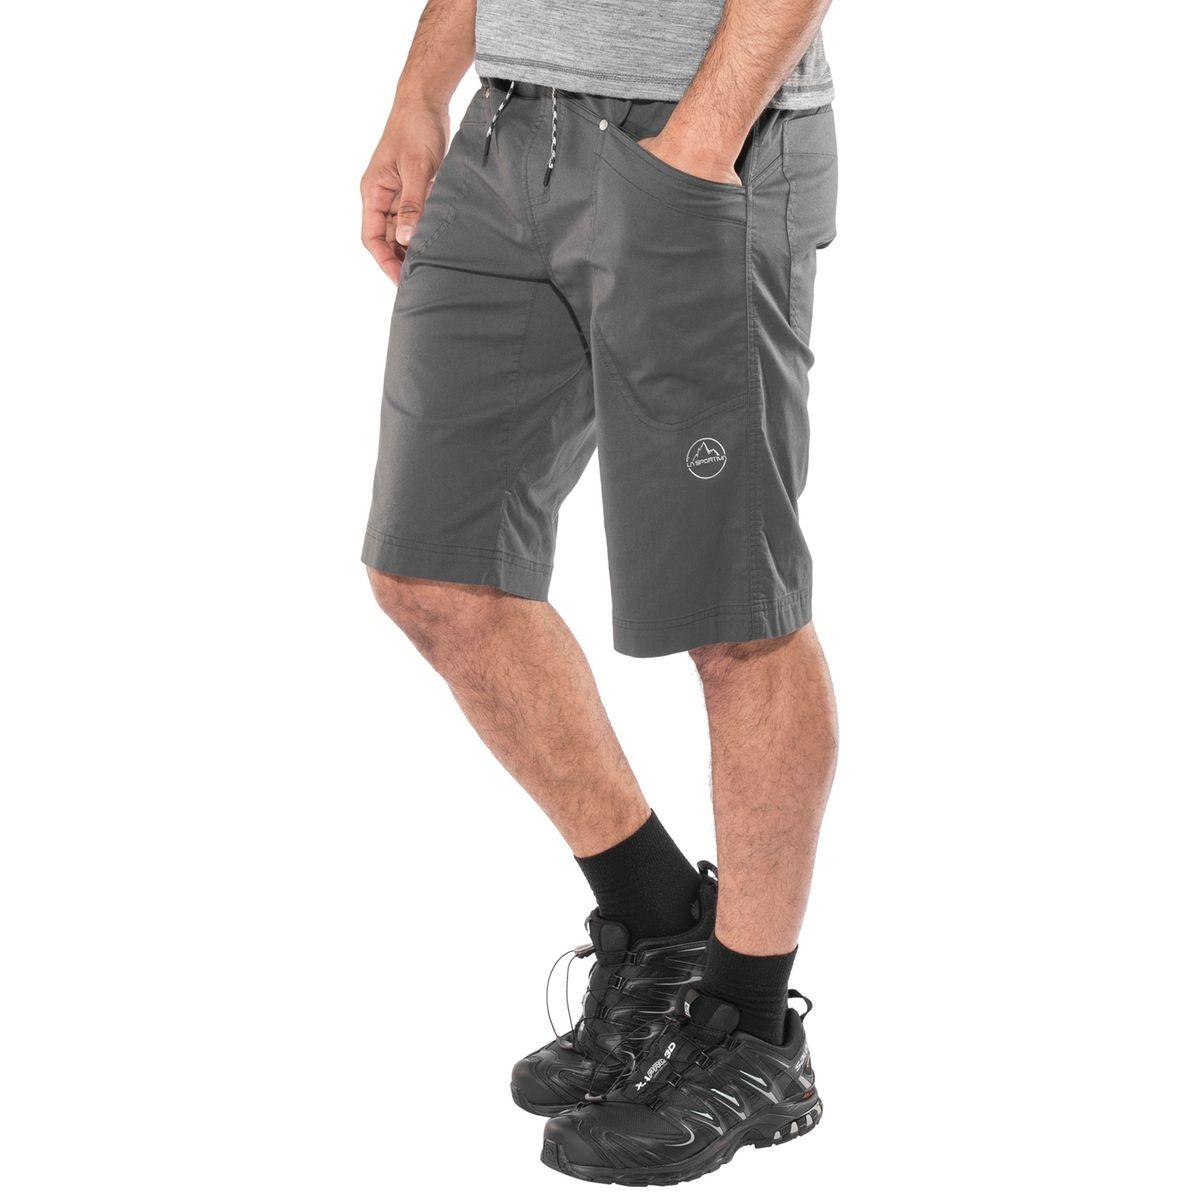 Bleauser - Shorts Homme - gris